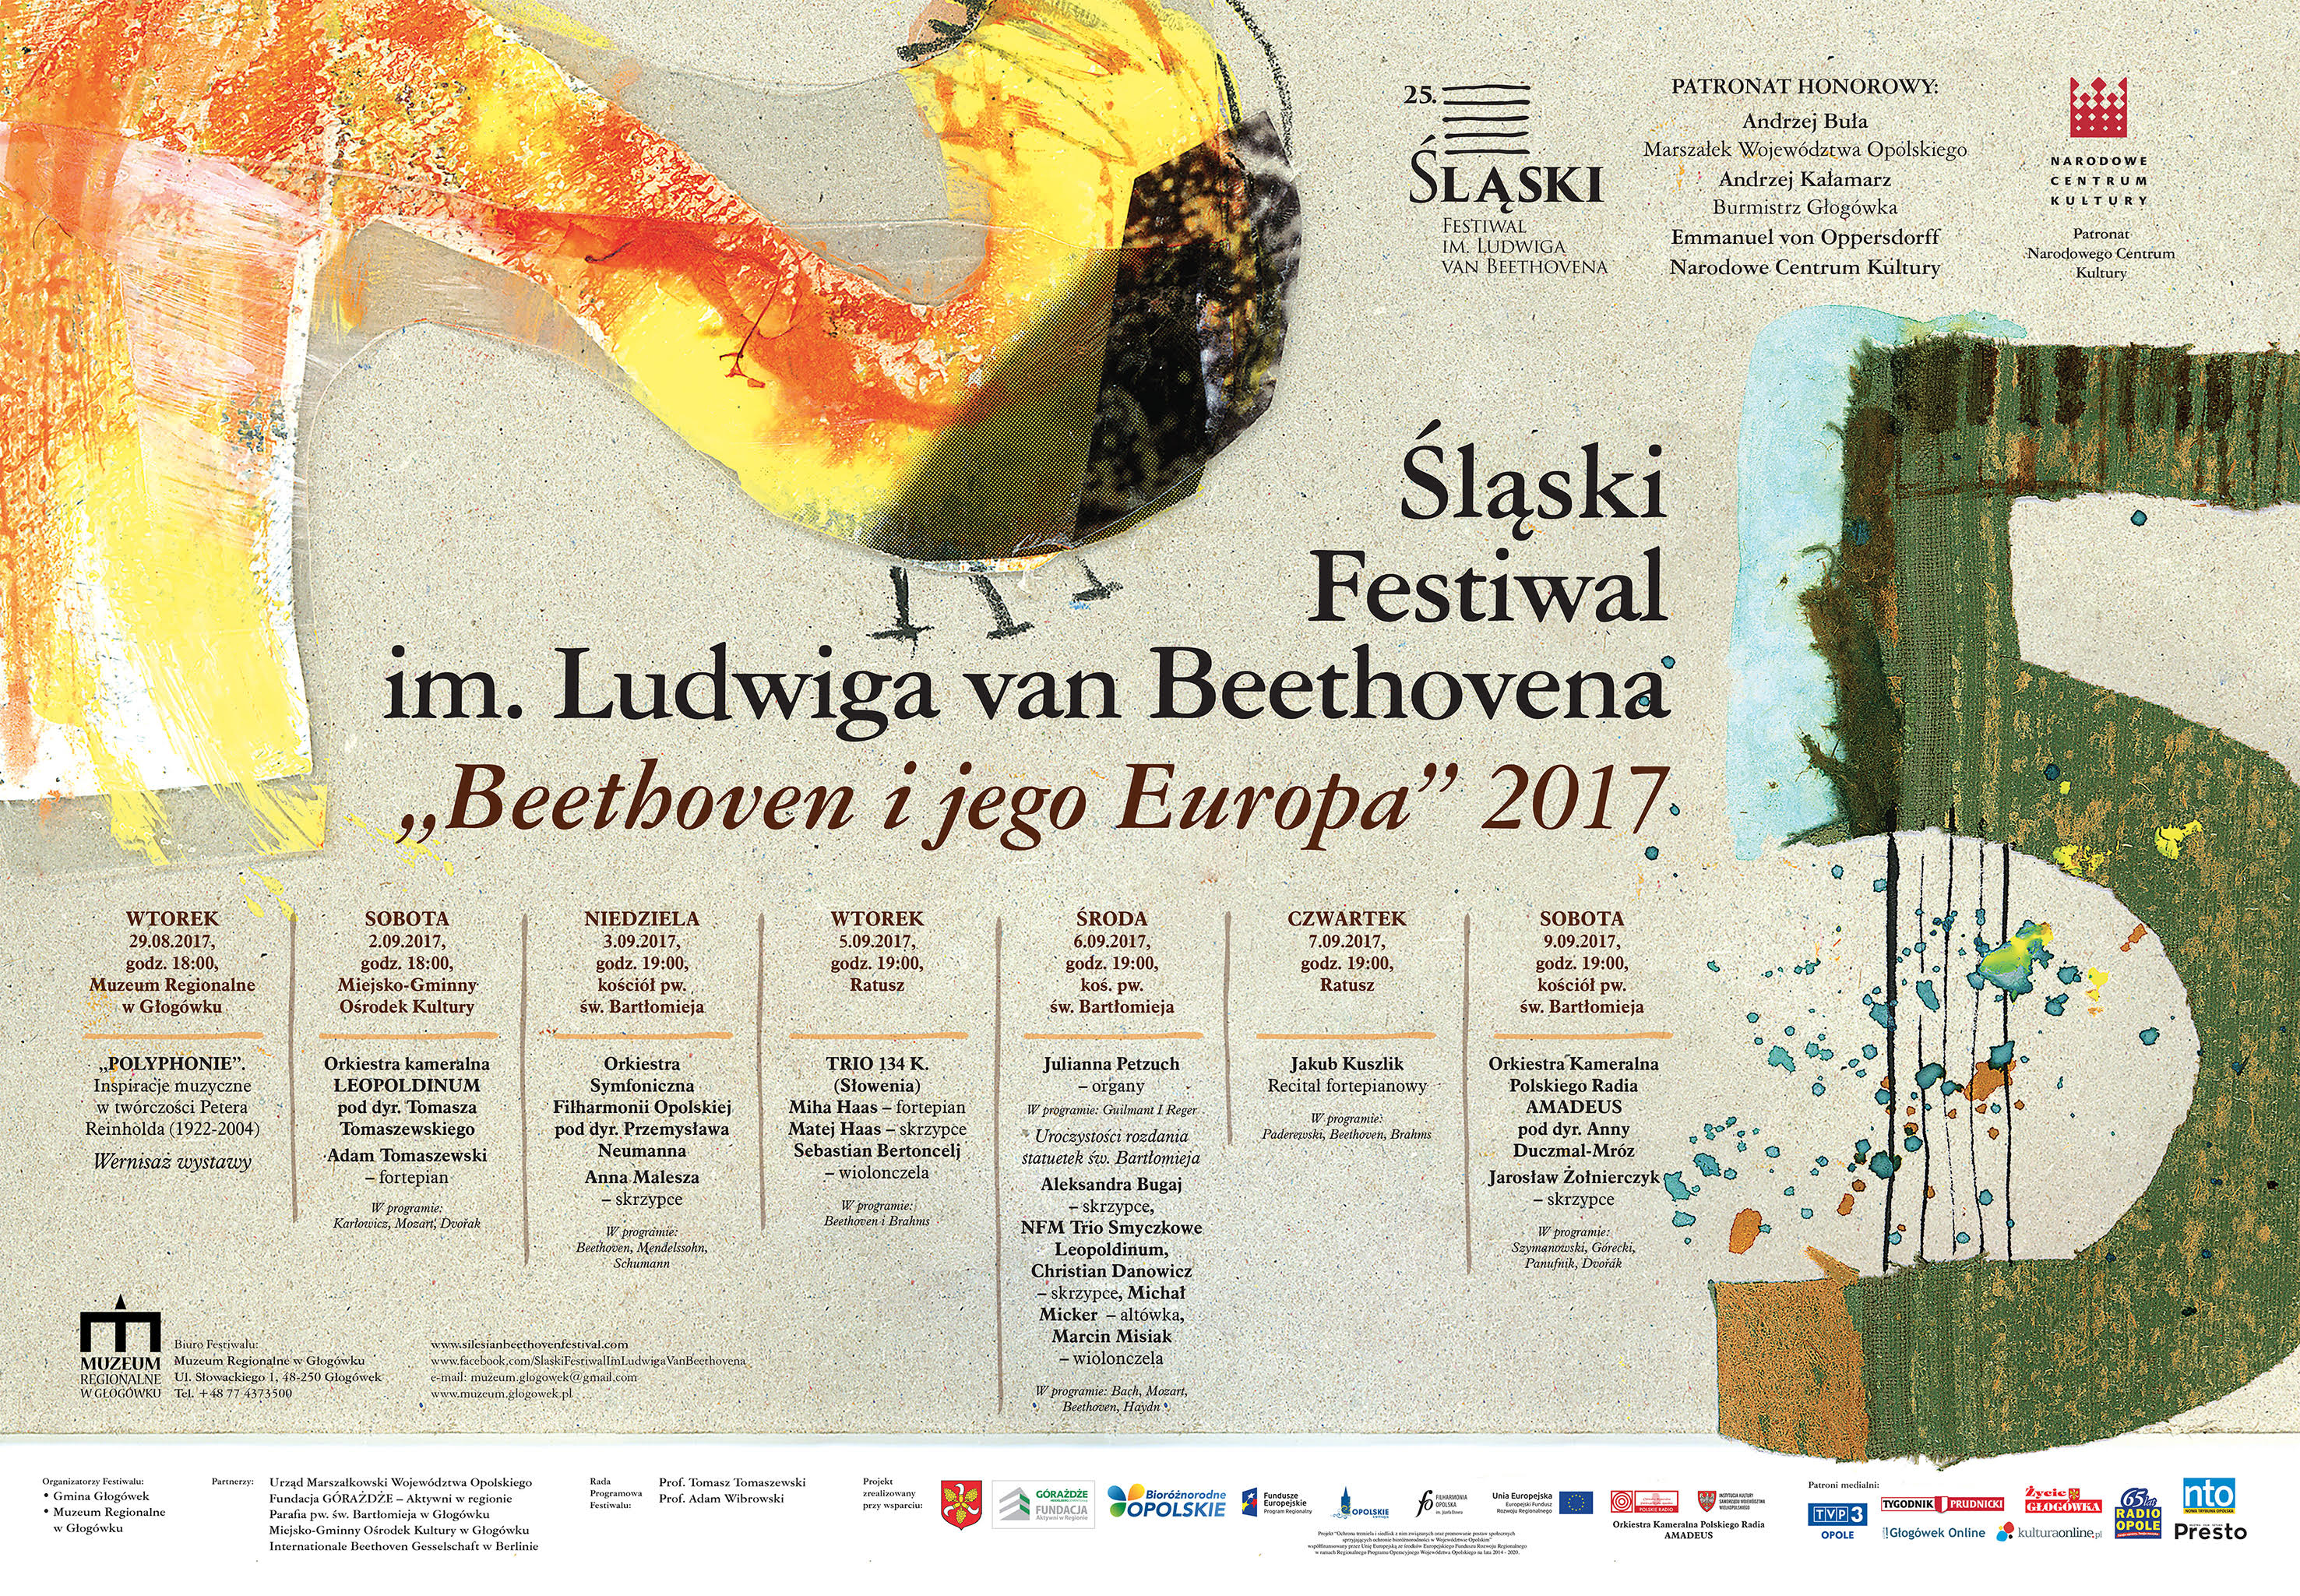 Śląski Festiwal im. Ludwiga van Beethovena doczekał się jubileuszu 25-lecia